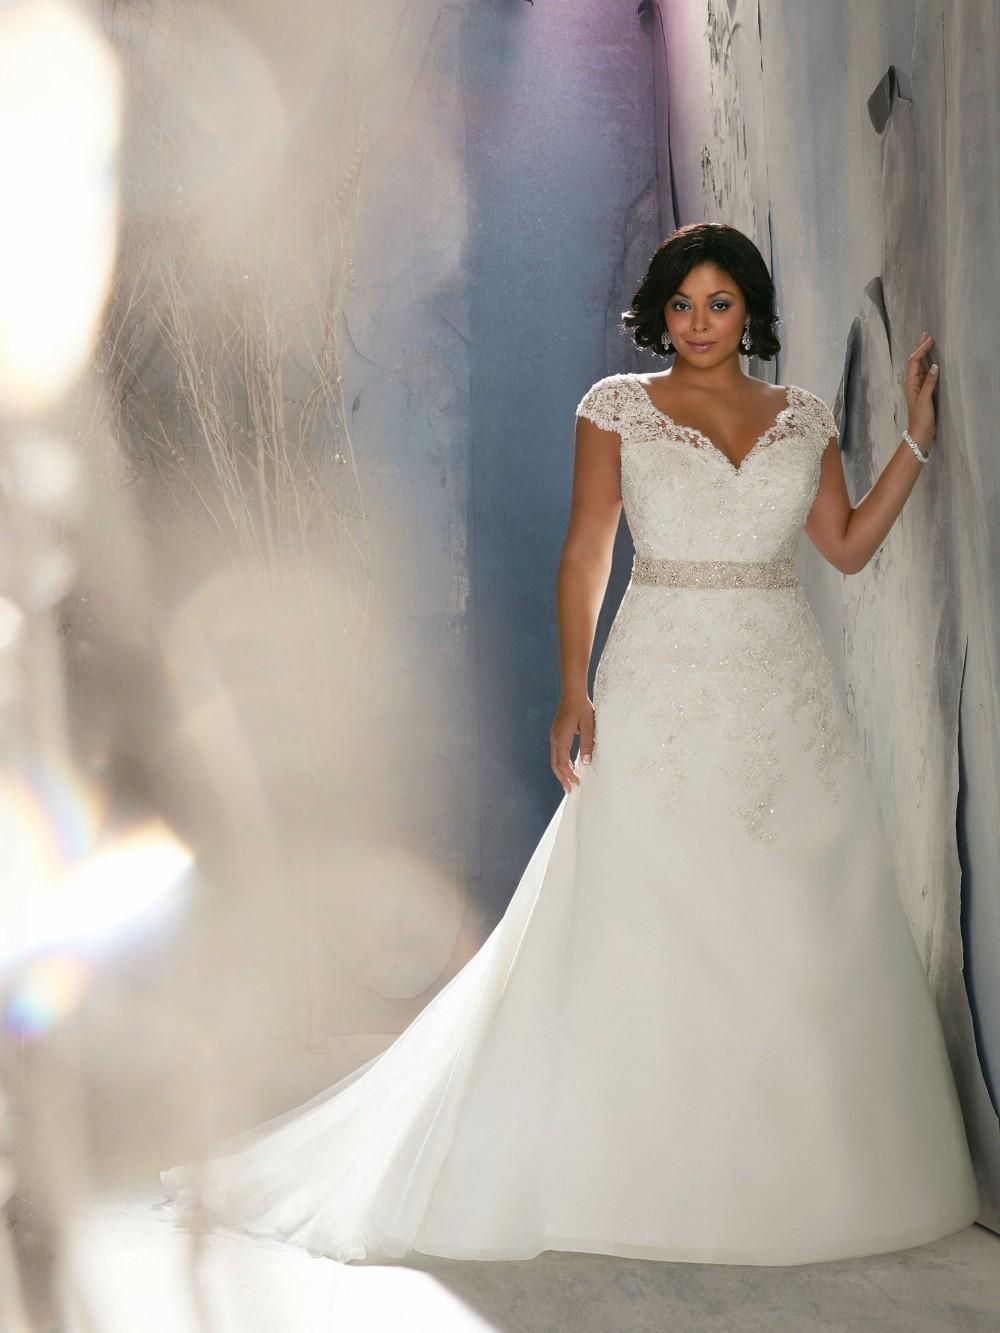 Vintage Lace Sheath Cap Sleeves Eopen Back Plus Size Mermaid Wedding Dress Bridal Gowns